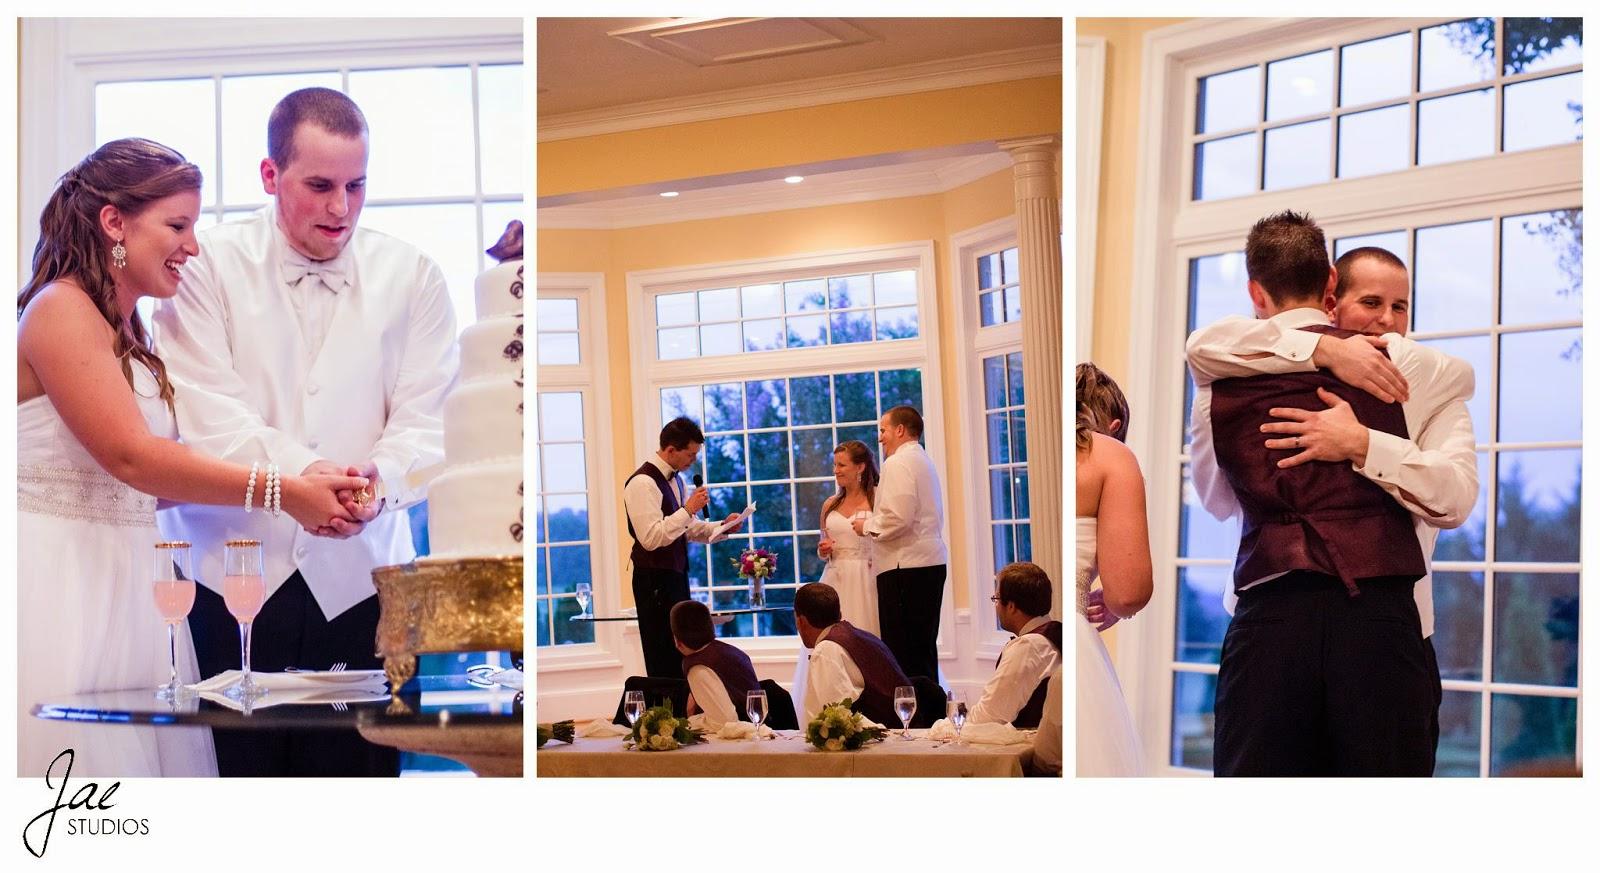 Jonathan and Julie, Bird cage, West Manor Estate, Wedding, Lynchburg, Virginia, Jae Studios, bride, groom, wedding dress, tuxedo, cutting, cake, hugging, best man speech, windows, pink, gold, purple